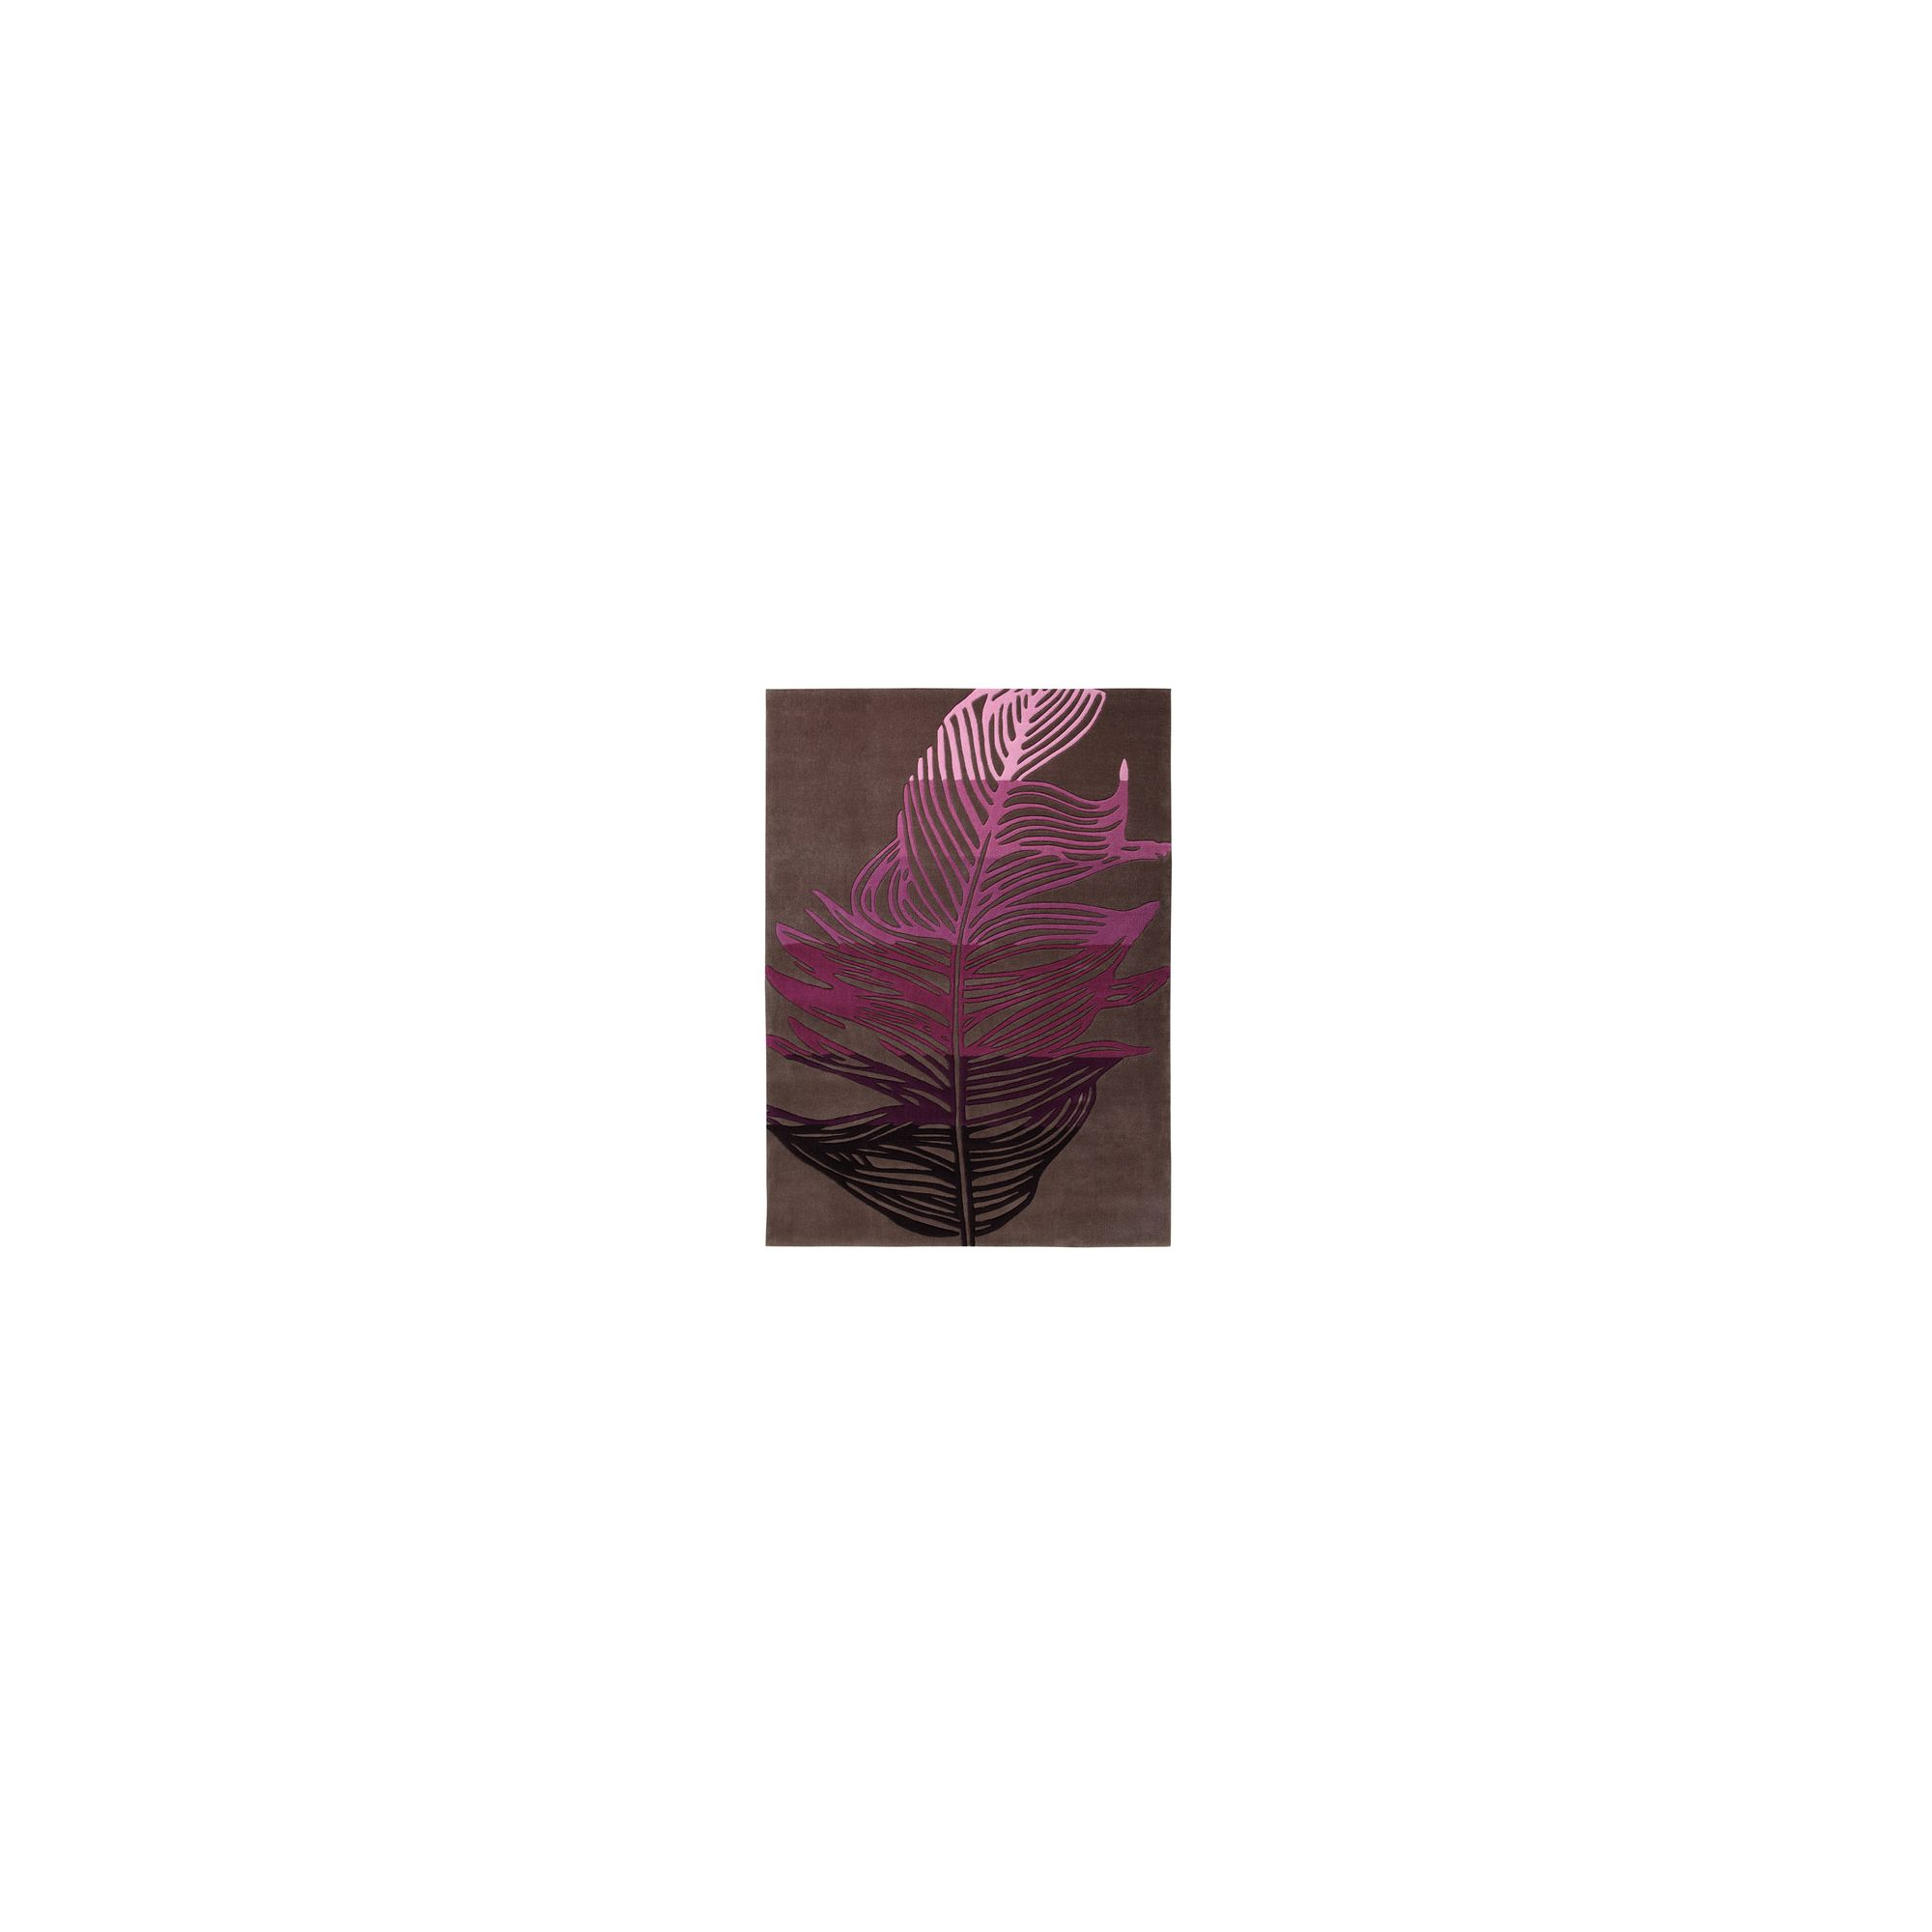 Esprit Feather Brown / Purple Novelty Rug - 120cm x 180cm